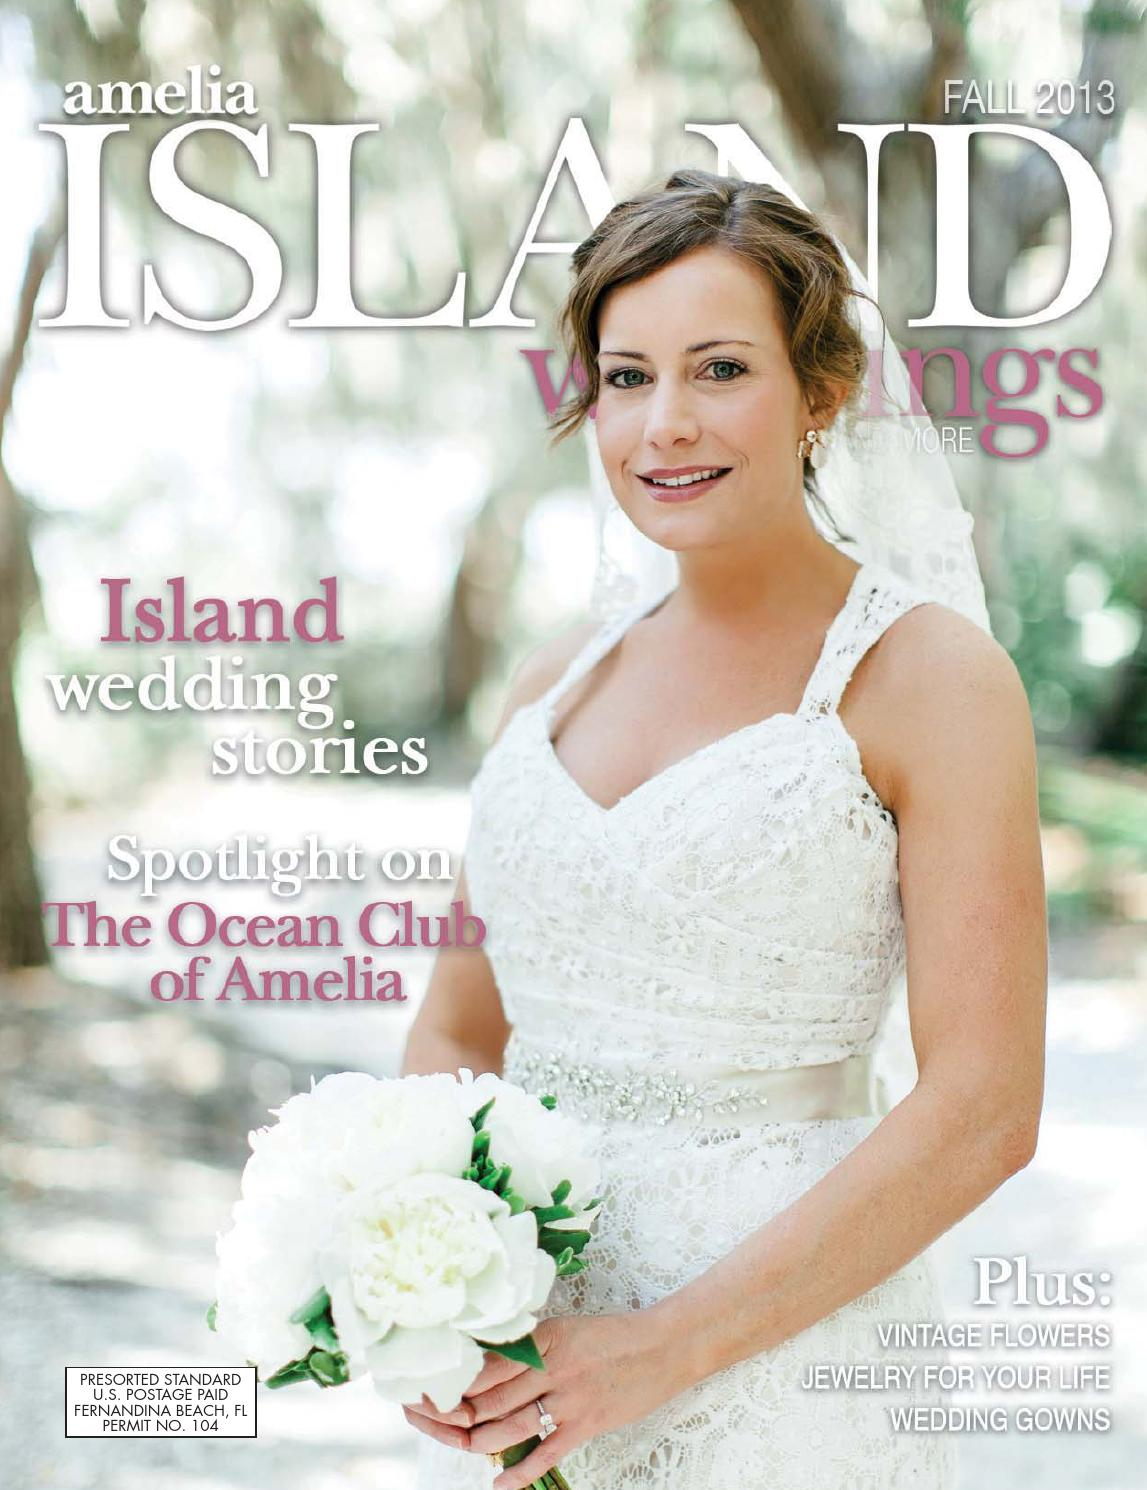 Amelia Island Weddings Fall 2013 By Sweetpea Media Inc Issuu